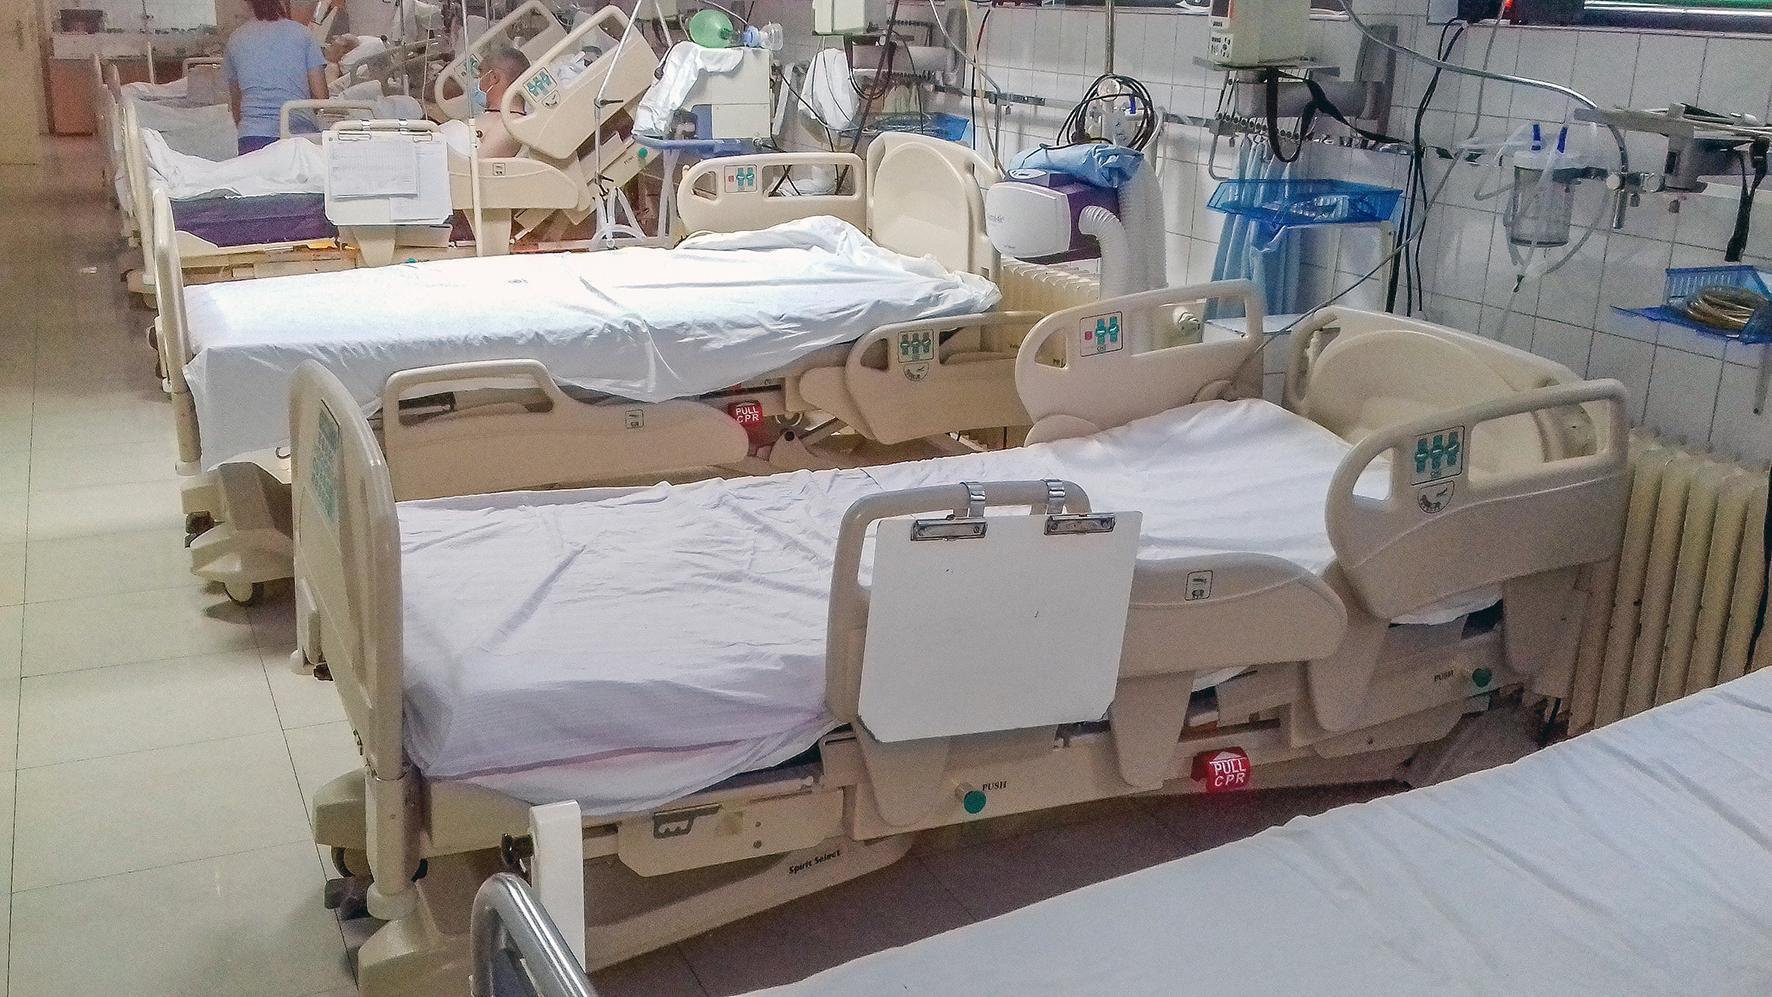 PRINCESS KATHERINE FOUNDATION DONATES ELECTRIC BEDS AND MATTRESSES VALUE 28,500 EUROS FOR CUPRIJA HOSPITAL